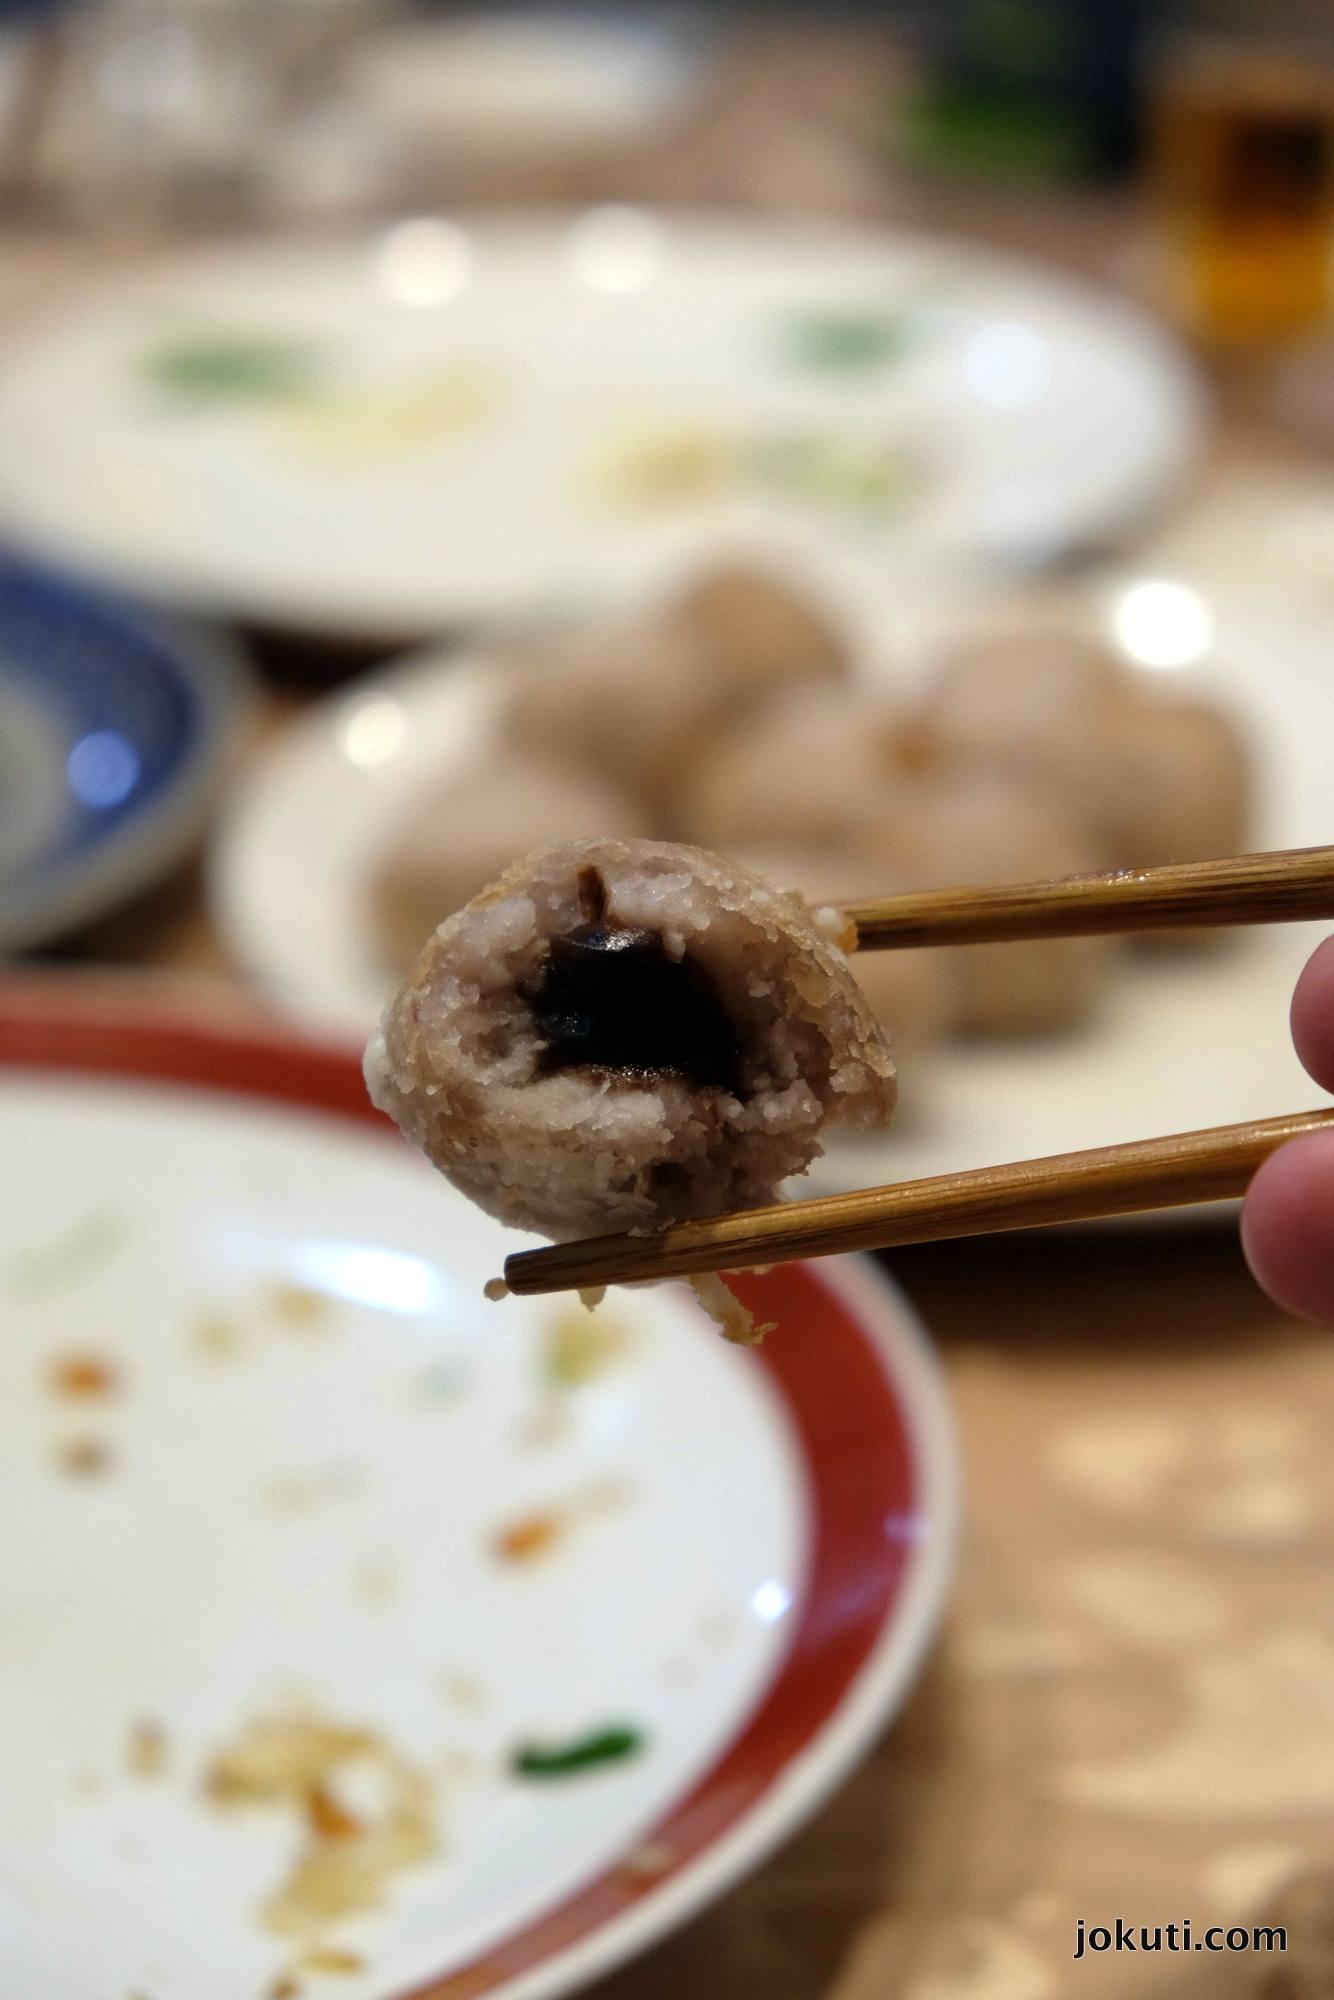 dscf2997_taipei_ming_fu_seafood_michelin_taiwan_vilagevo_jokuti.jpg